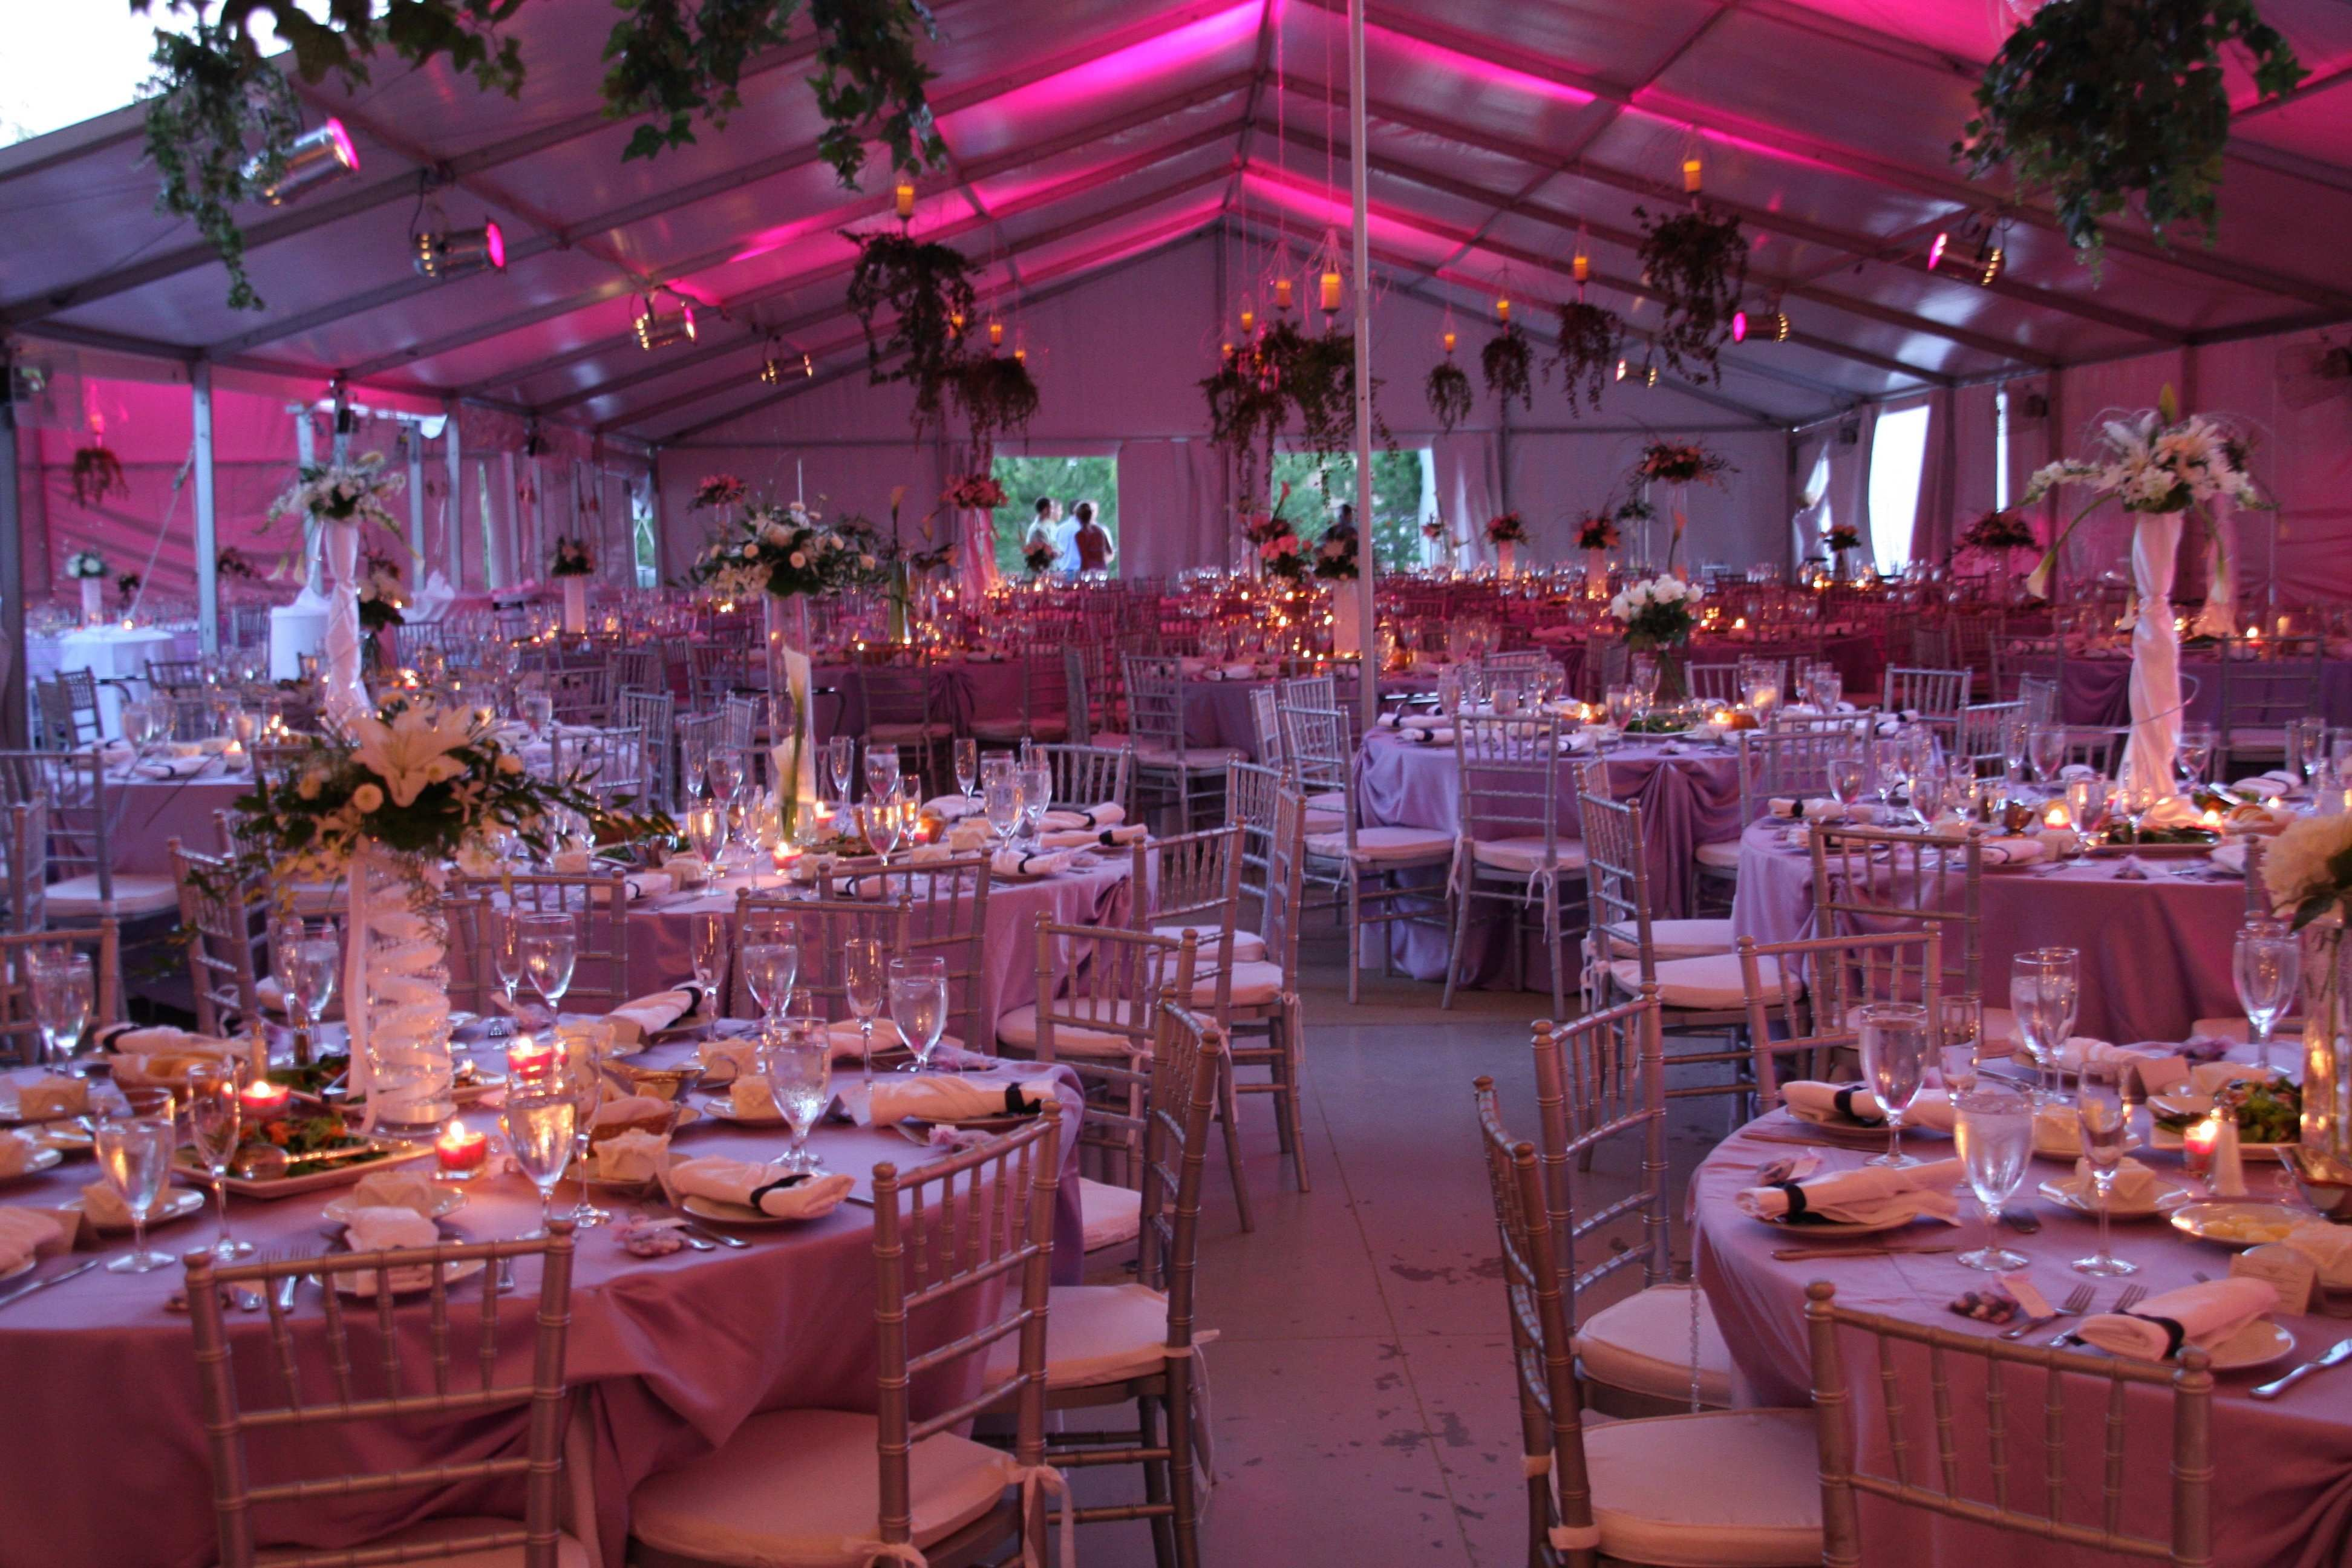 Hemingways wooden arbor decor wedding gazebos pinterest august wedding colors pics for aug solutioingenieria Images